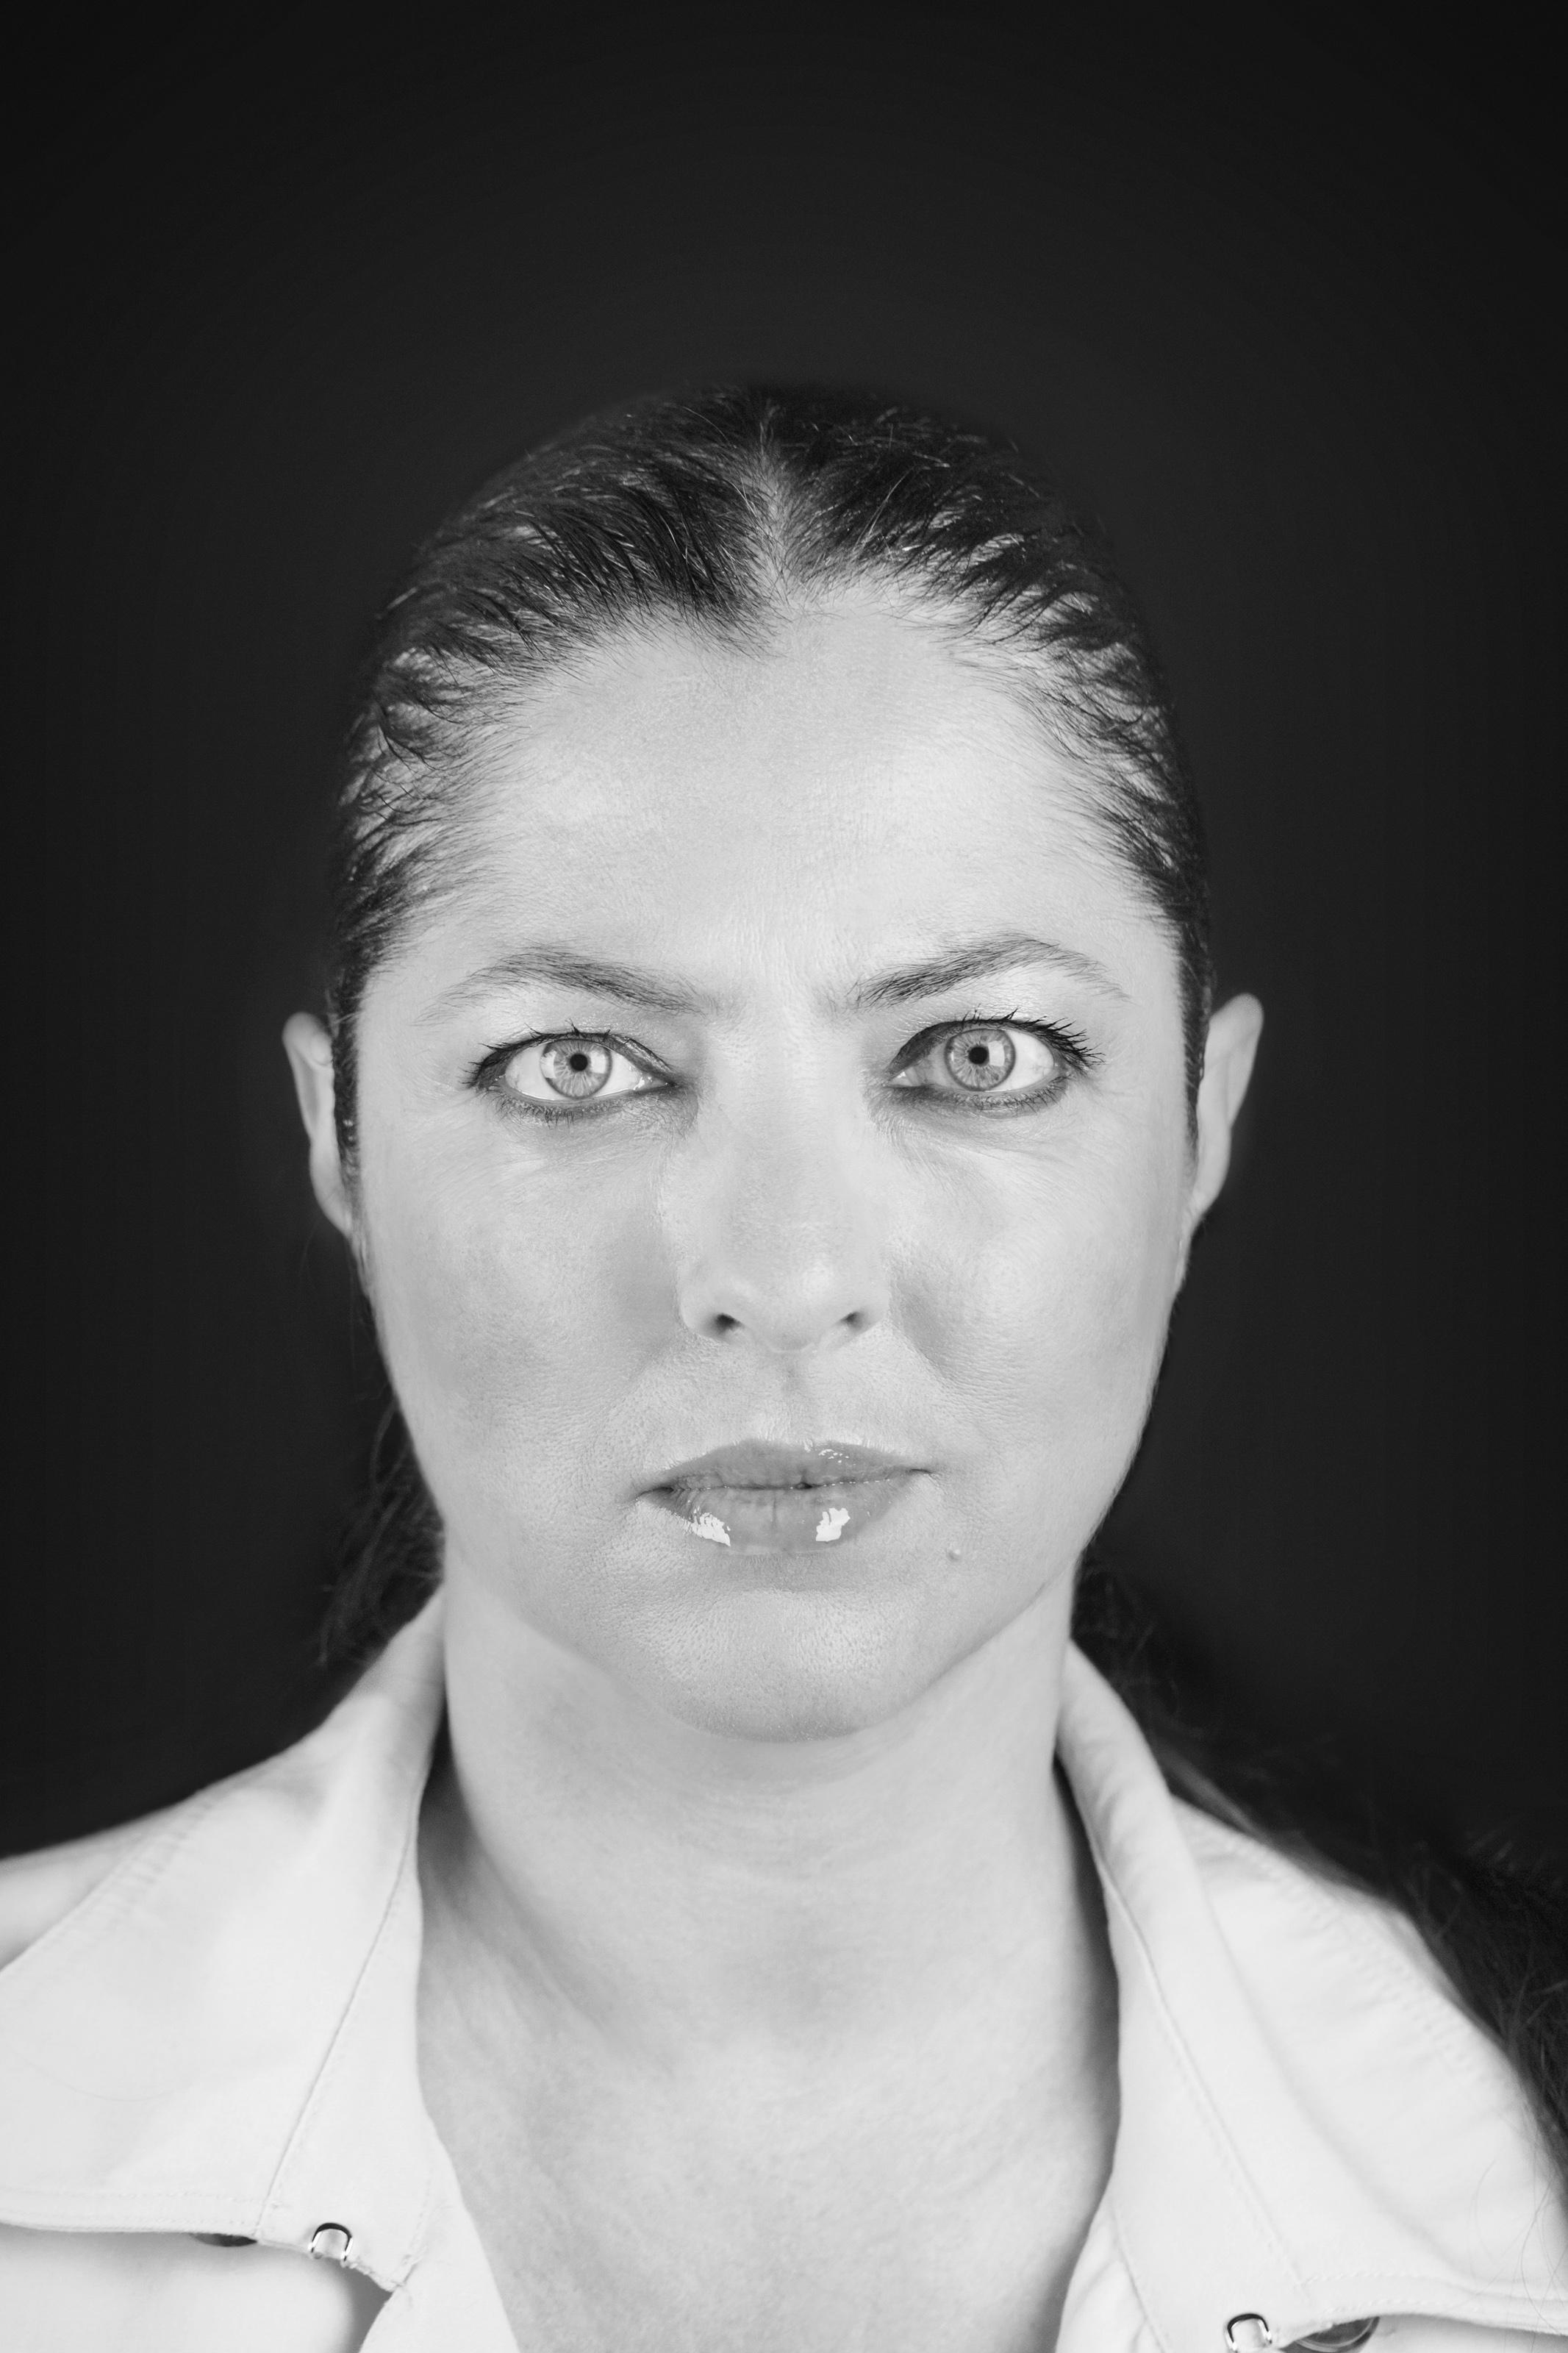 stefania petyx - photo #12